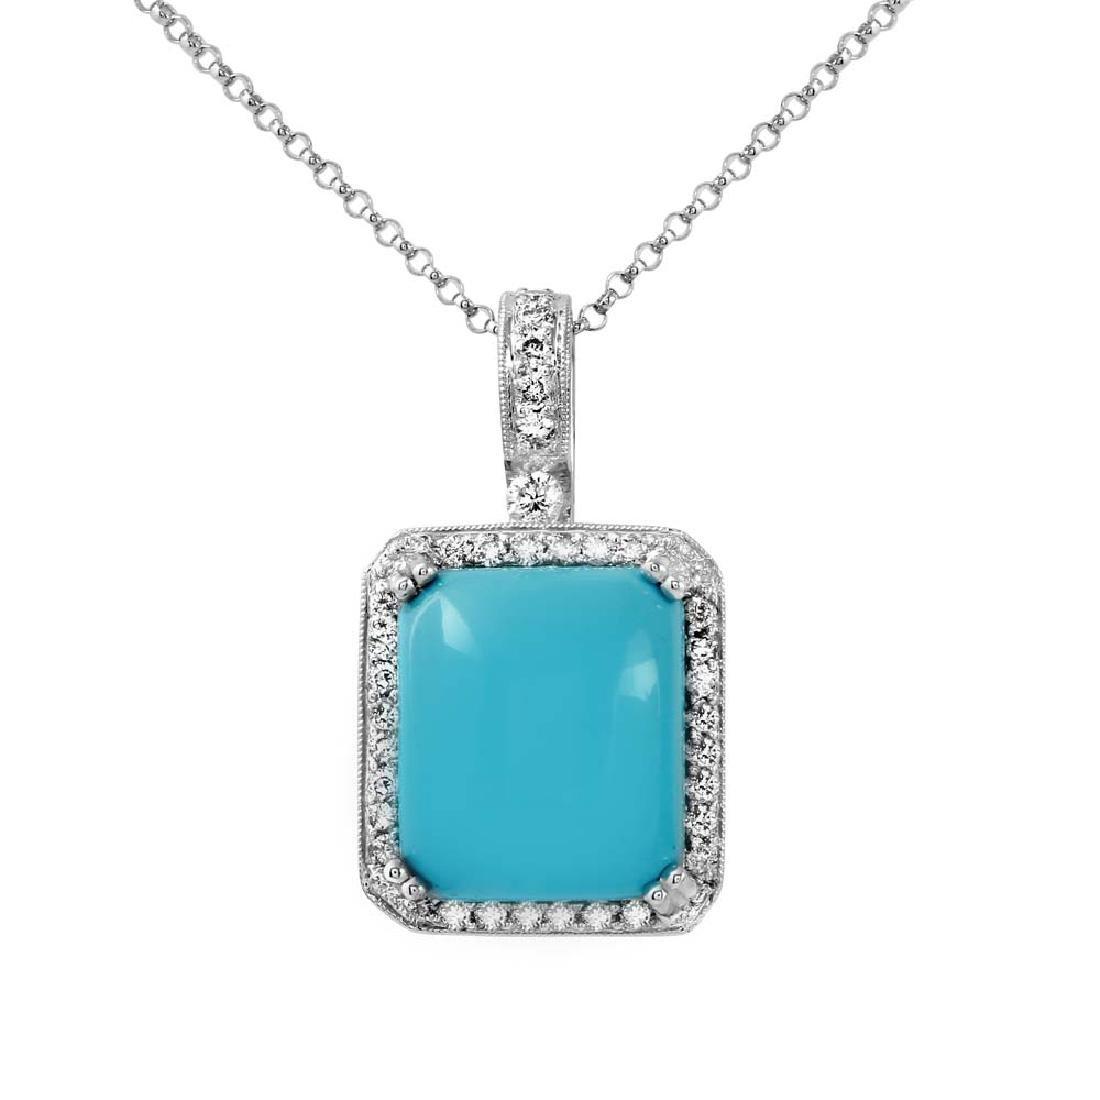 Genuine 0.49 TCW 14K White Gold Ladies Necklace -